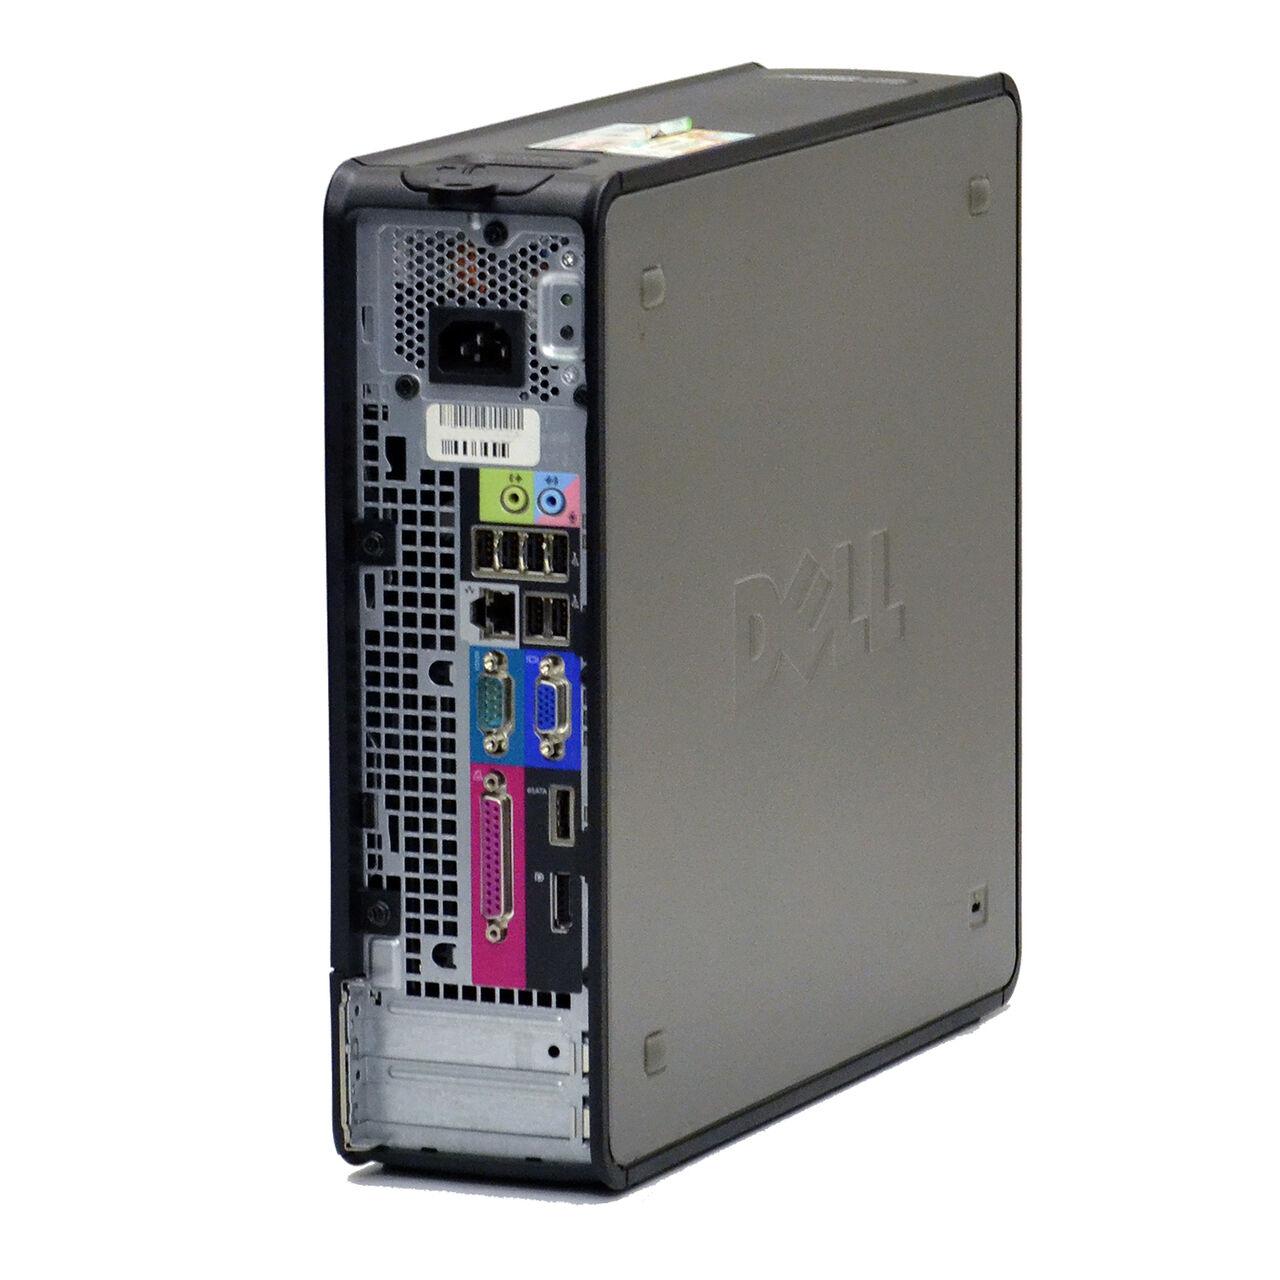 Dell Tower Desktop Computer Pc Core 2 Duo 4gb Ram 1tb Hard